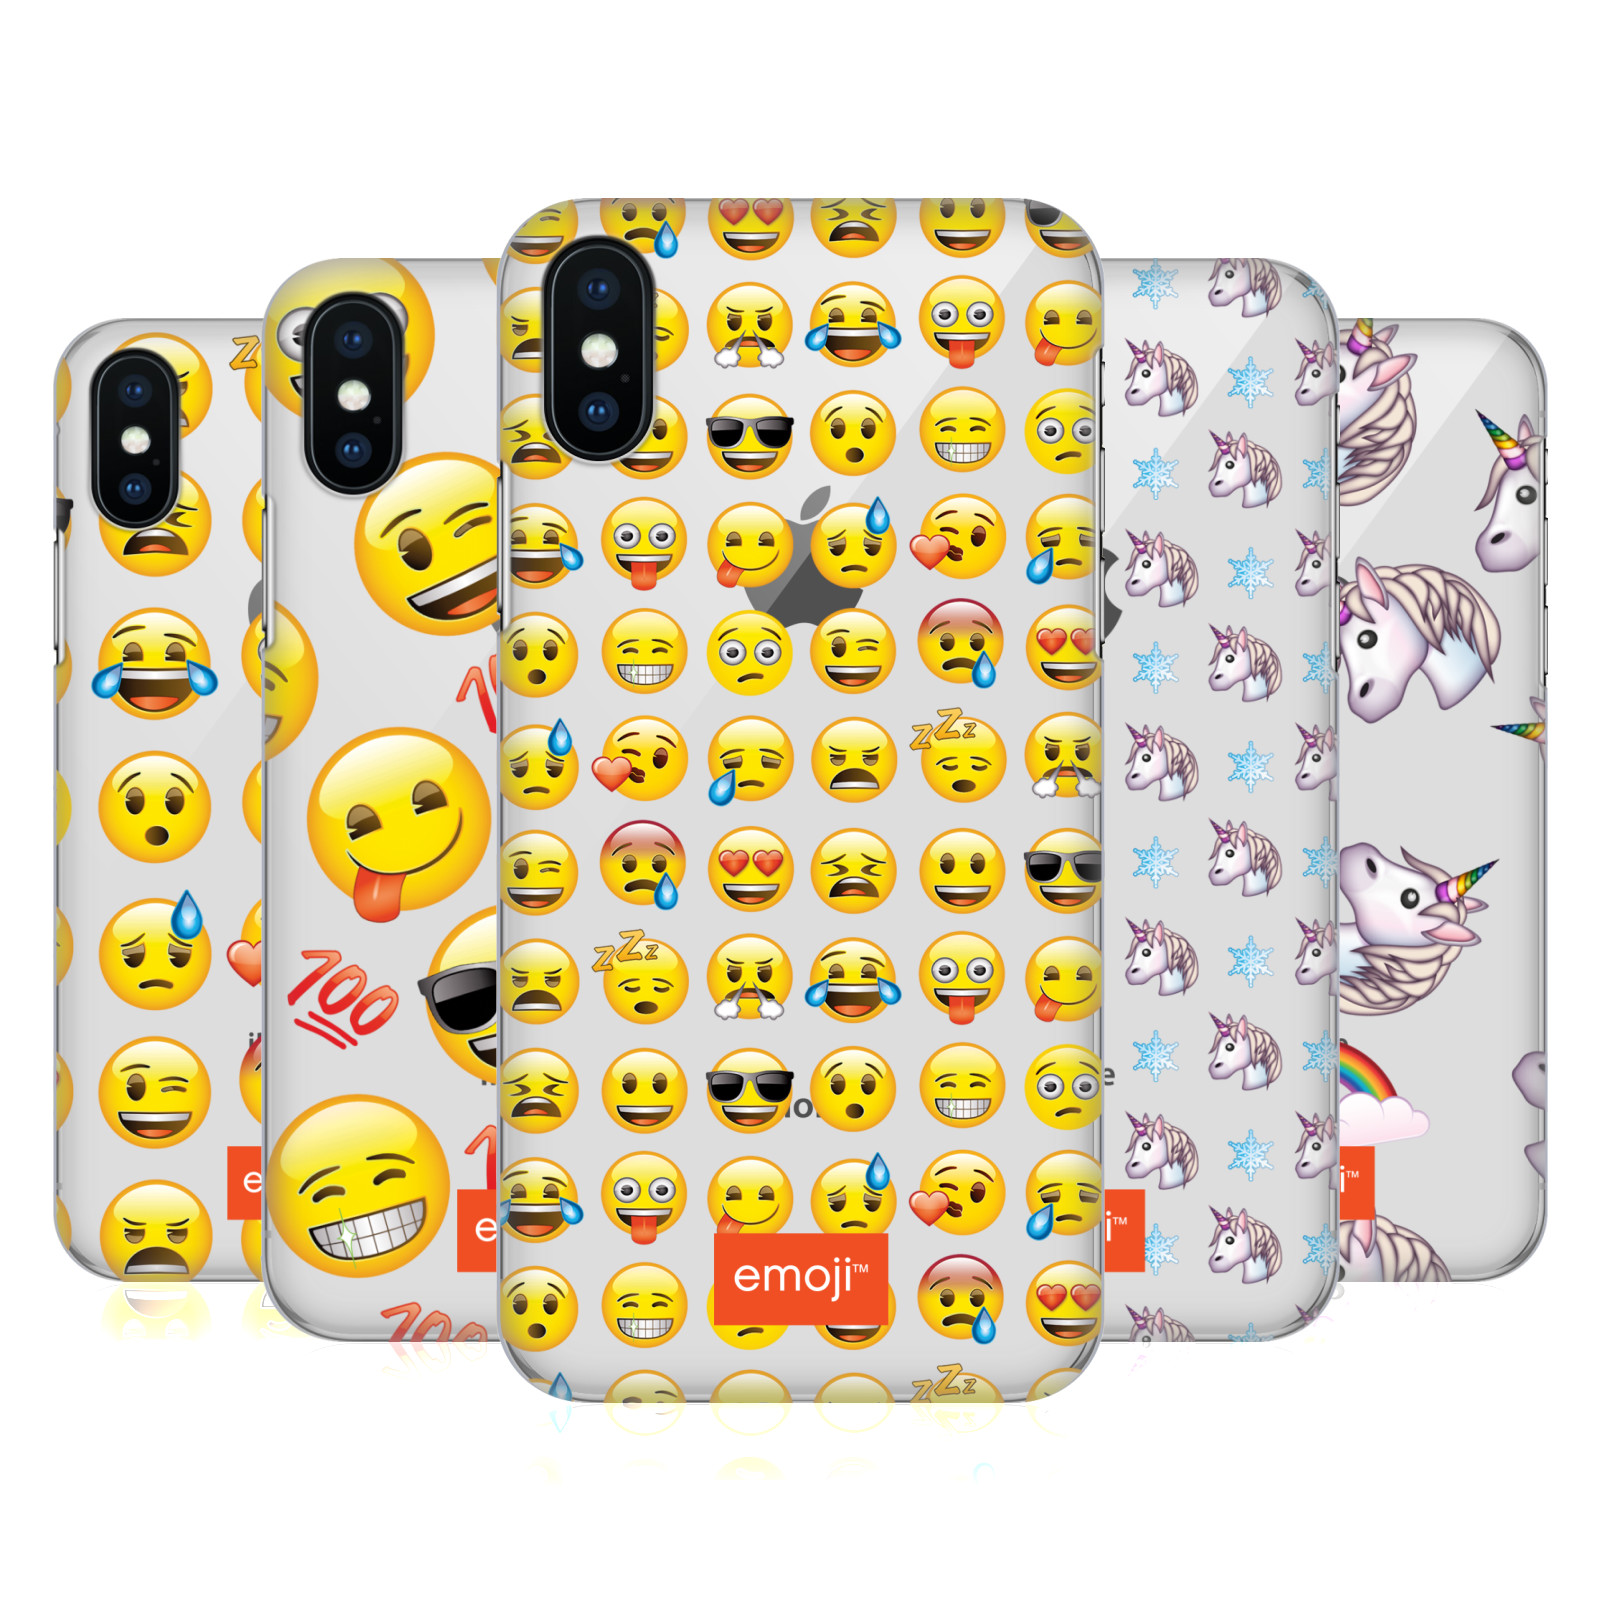 emoji® Patterns 4